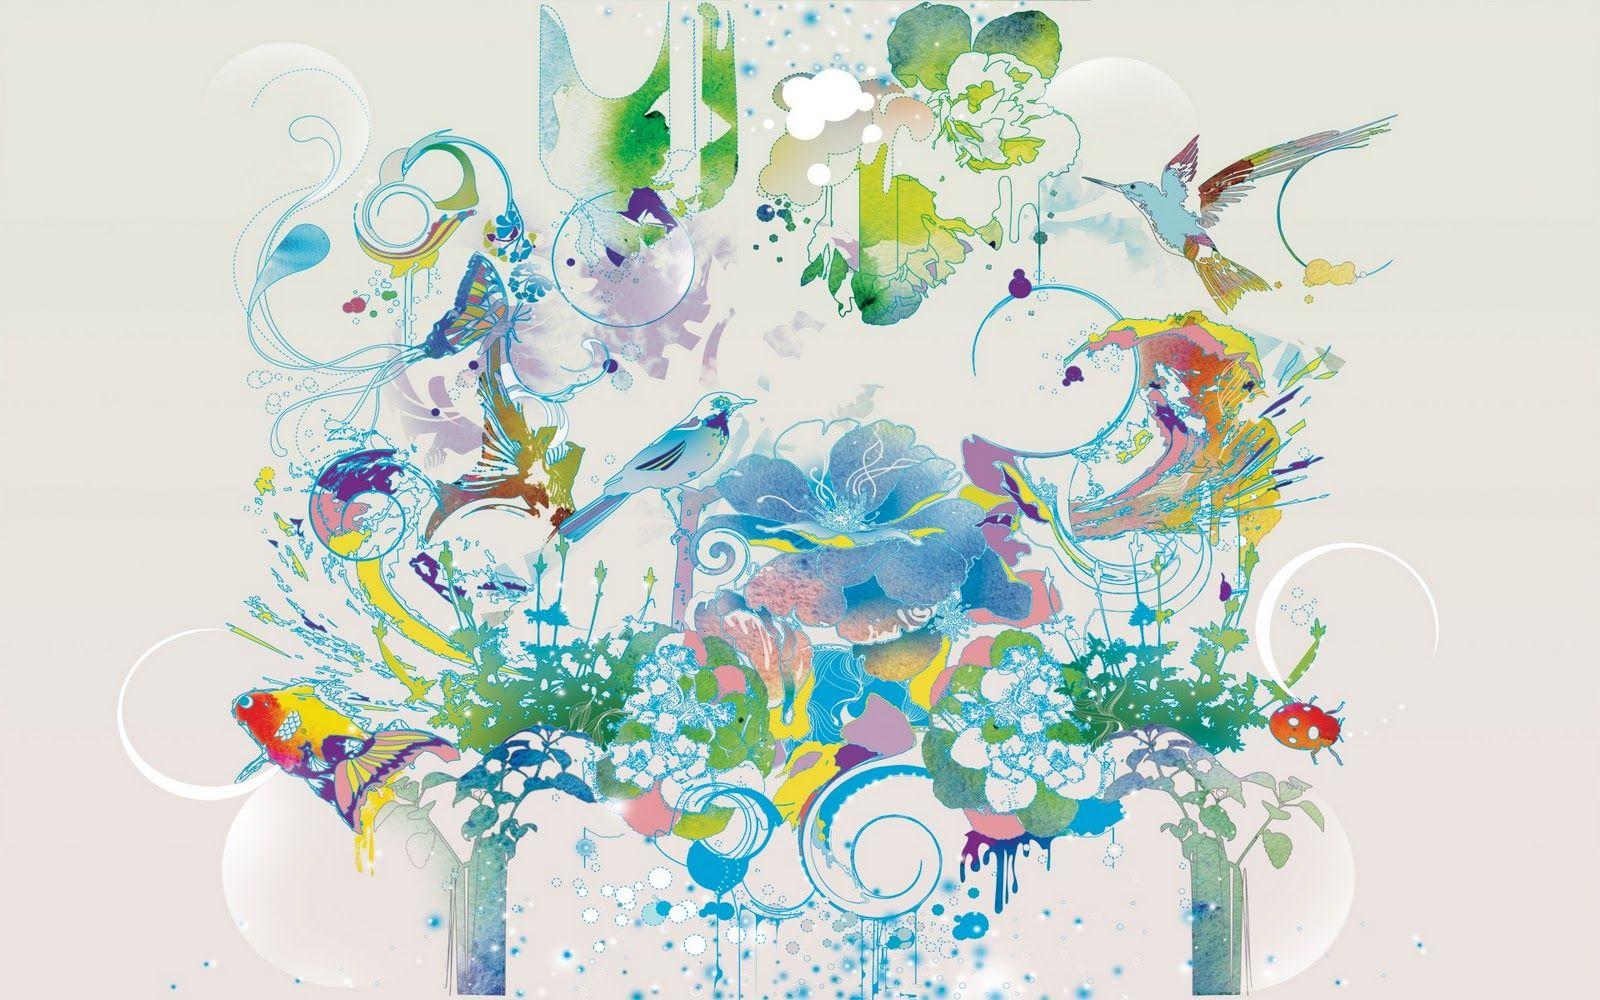 Must see Wallpaper High Resolution Painting - 171b11752a78979901700e7ccd85e75b  Pic_100117.jpg